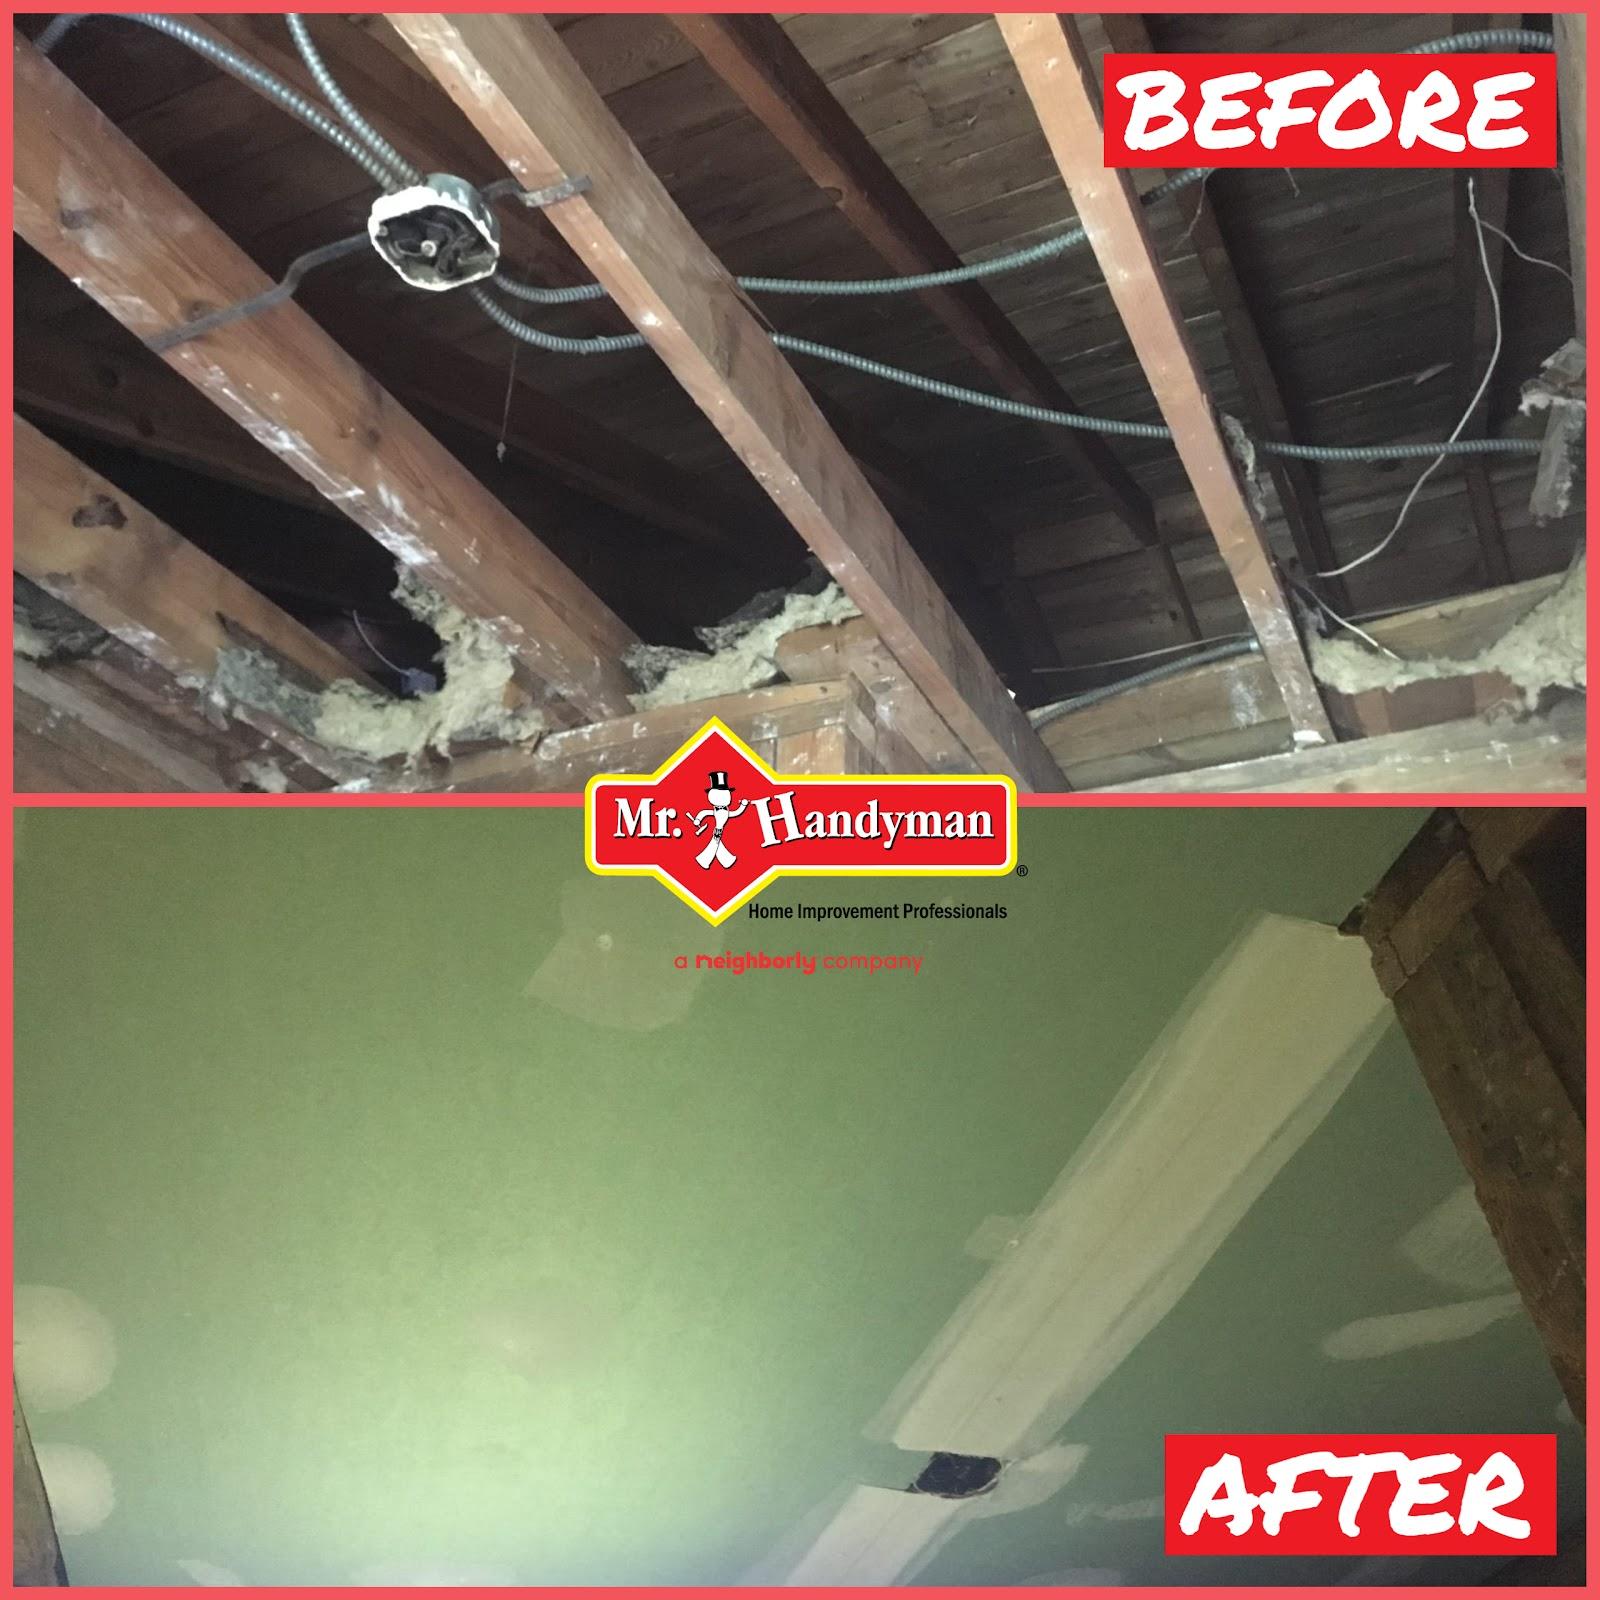 Drywall repair, Fairfax Station VA.